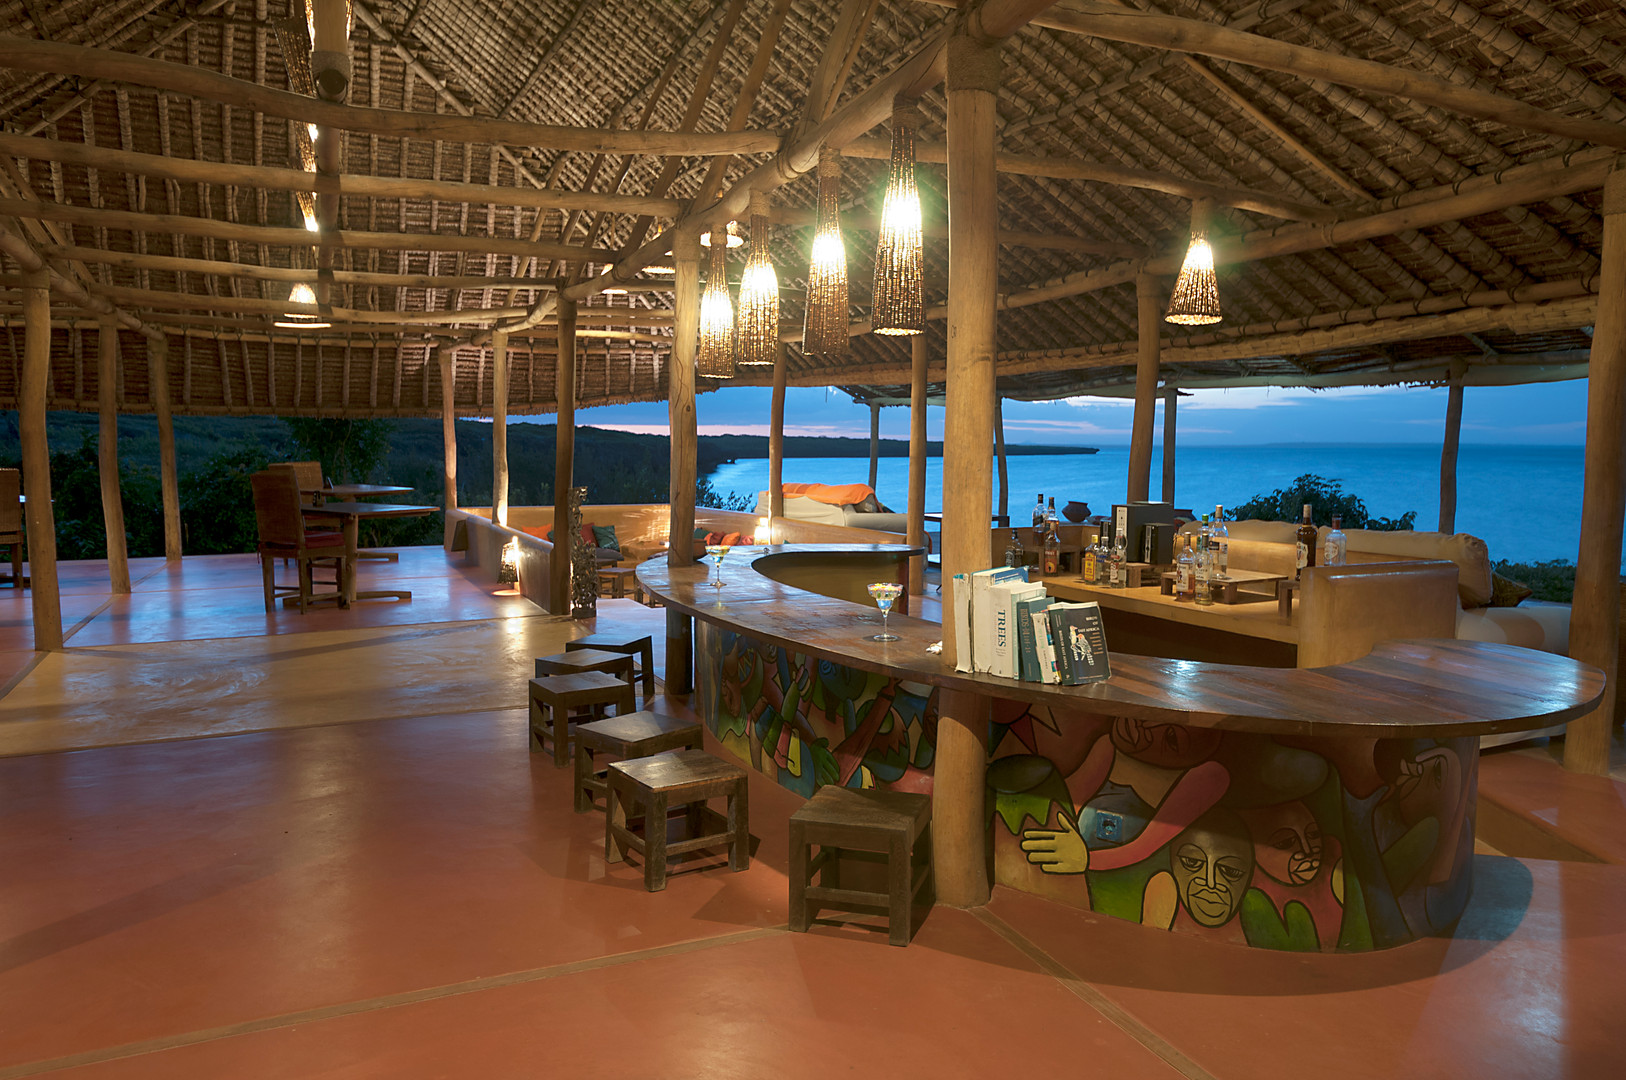 Nuno's photo restaurant and beach bar HR